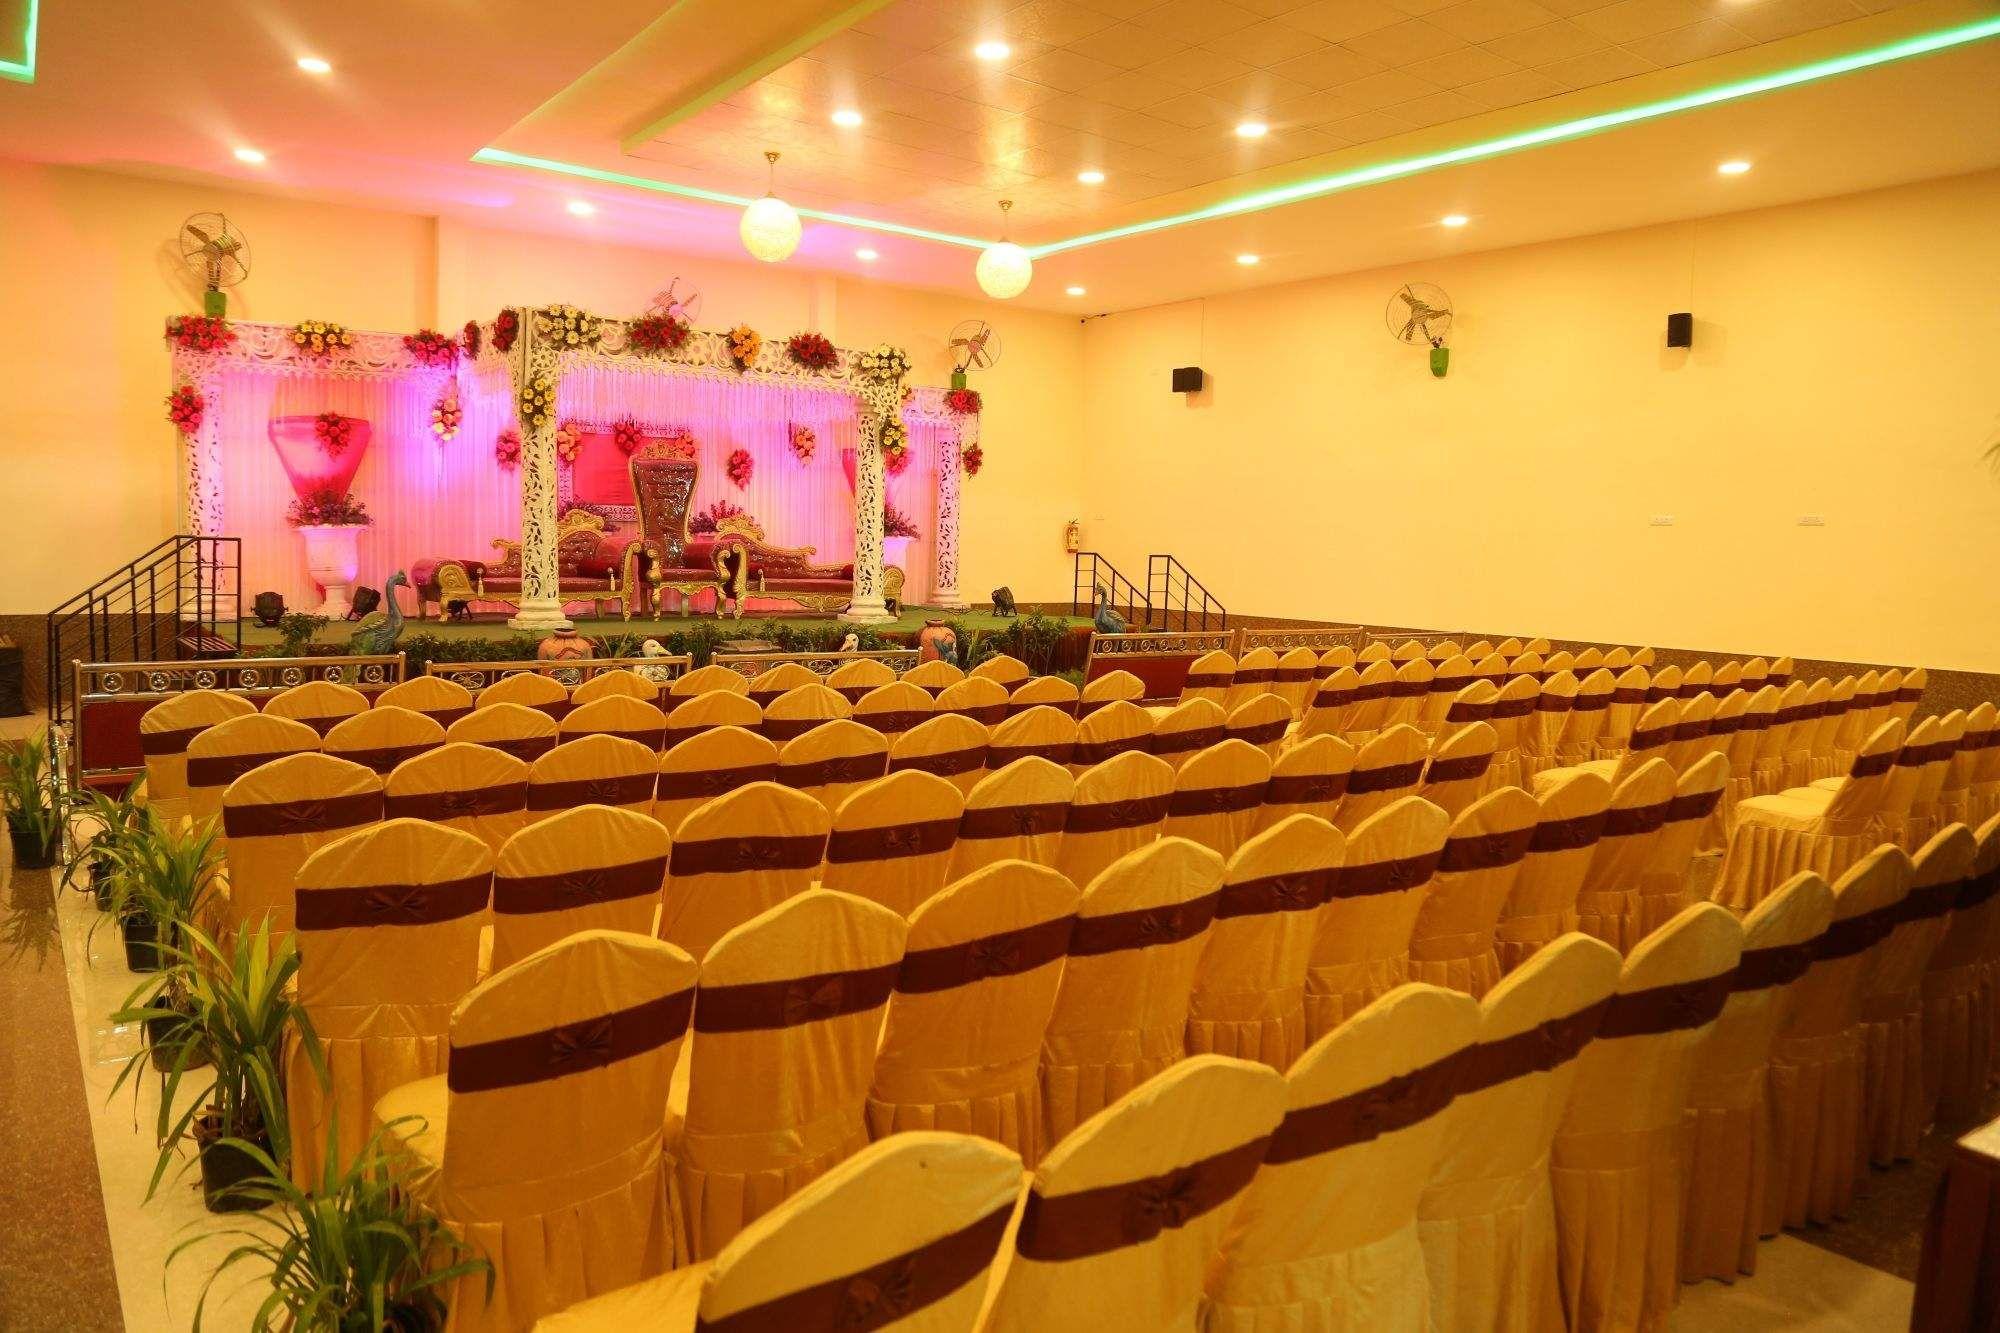 7bea116a2d64f45ae116c893d6eba392 - Image Gardens Function Hall Hyderabad Telangana